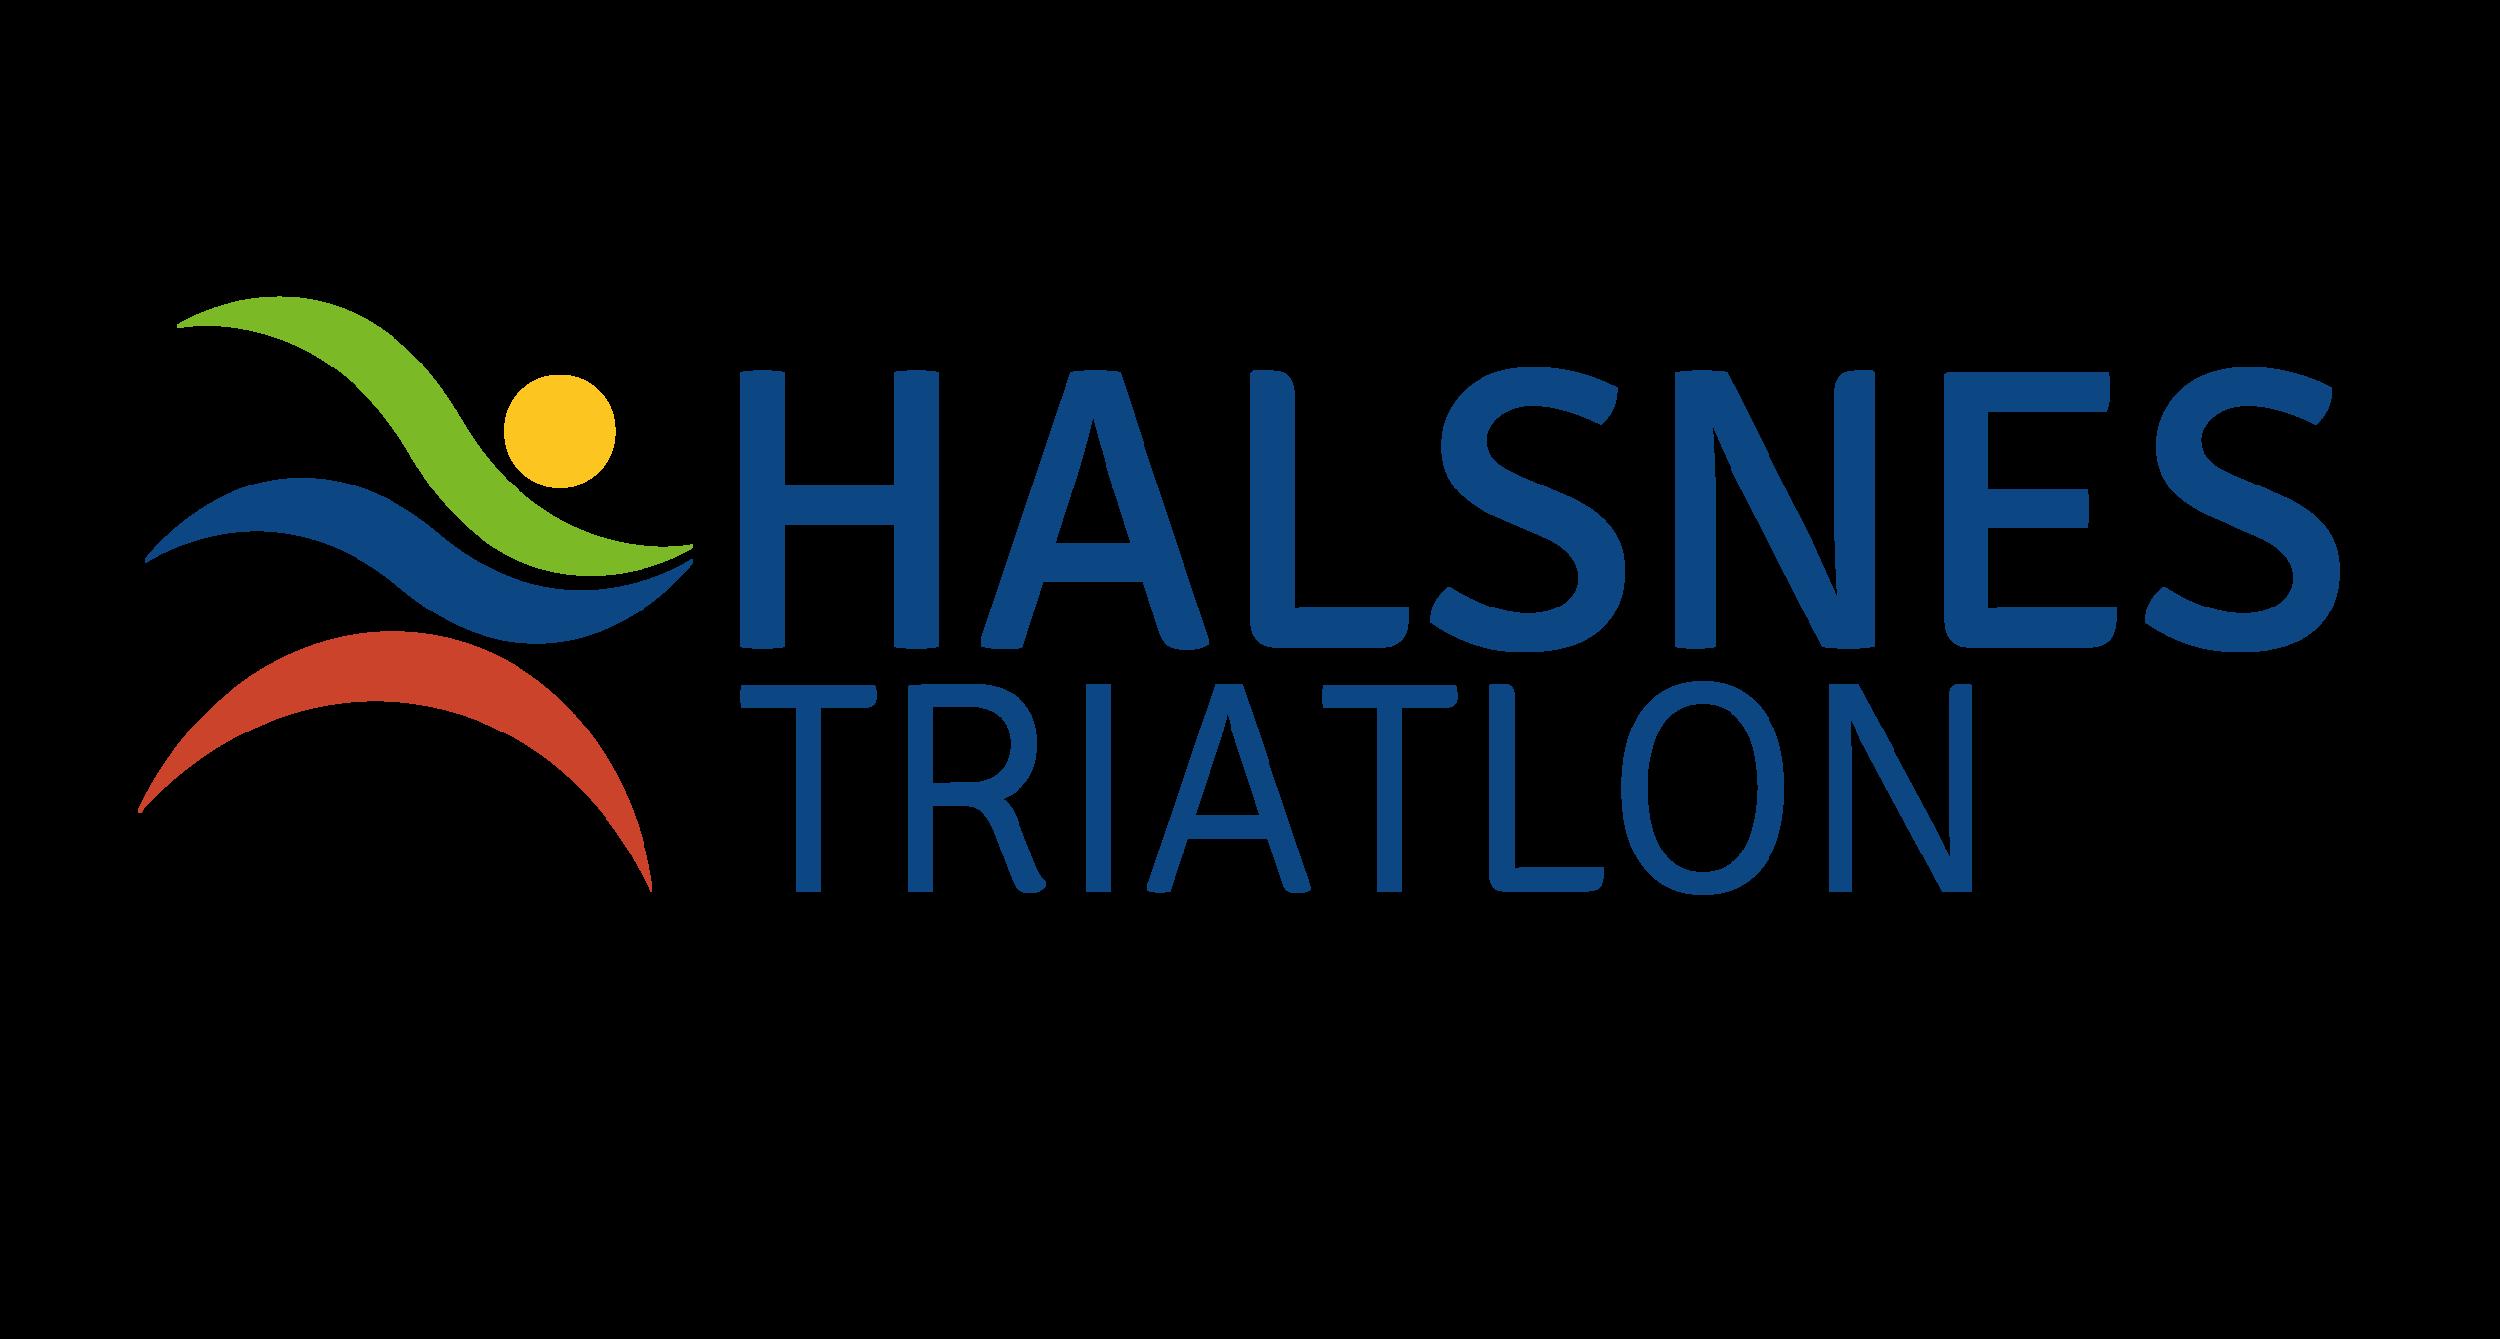 Halsnes-Triatlon.png